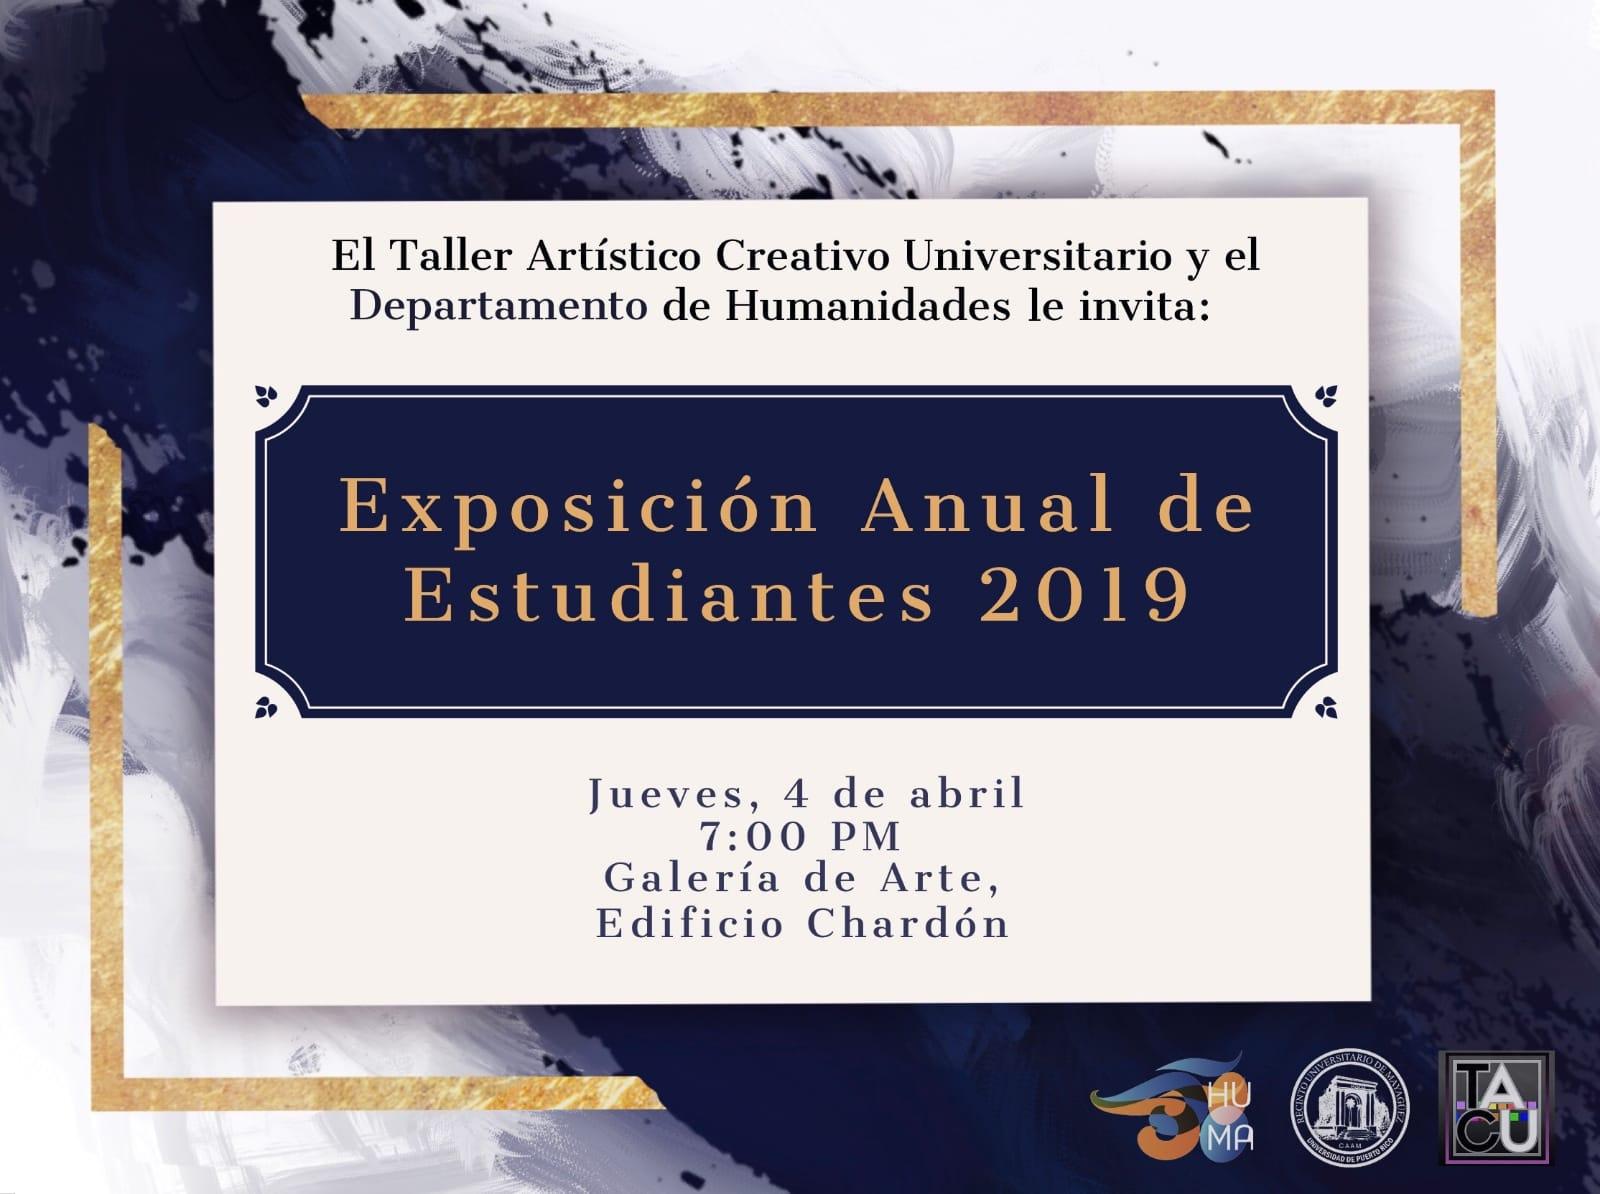 Exposicion Anual de Estudiantes 2019